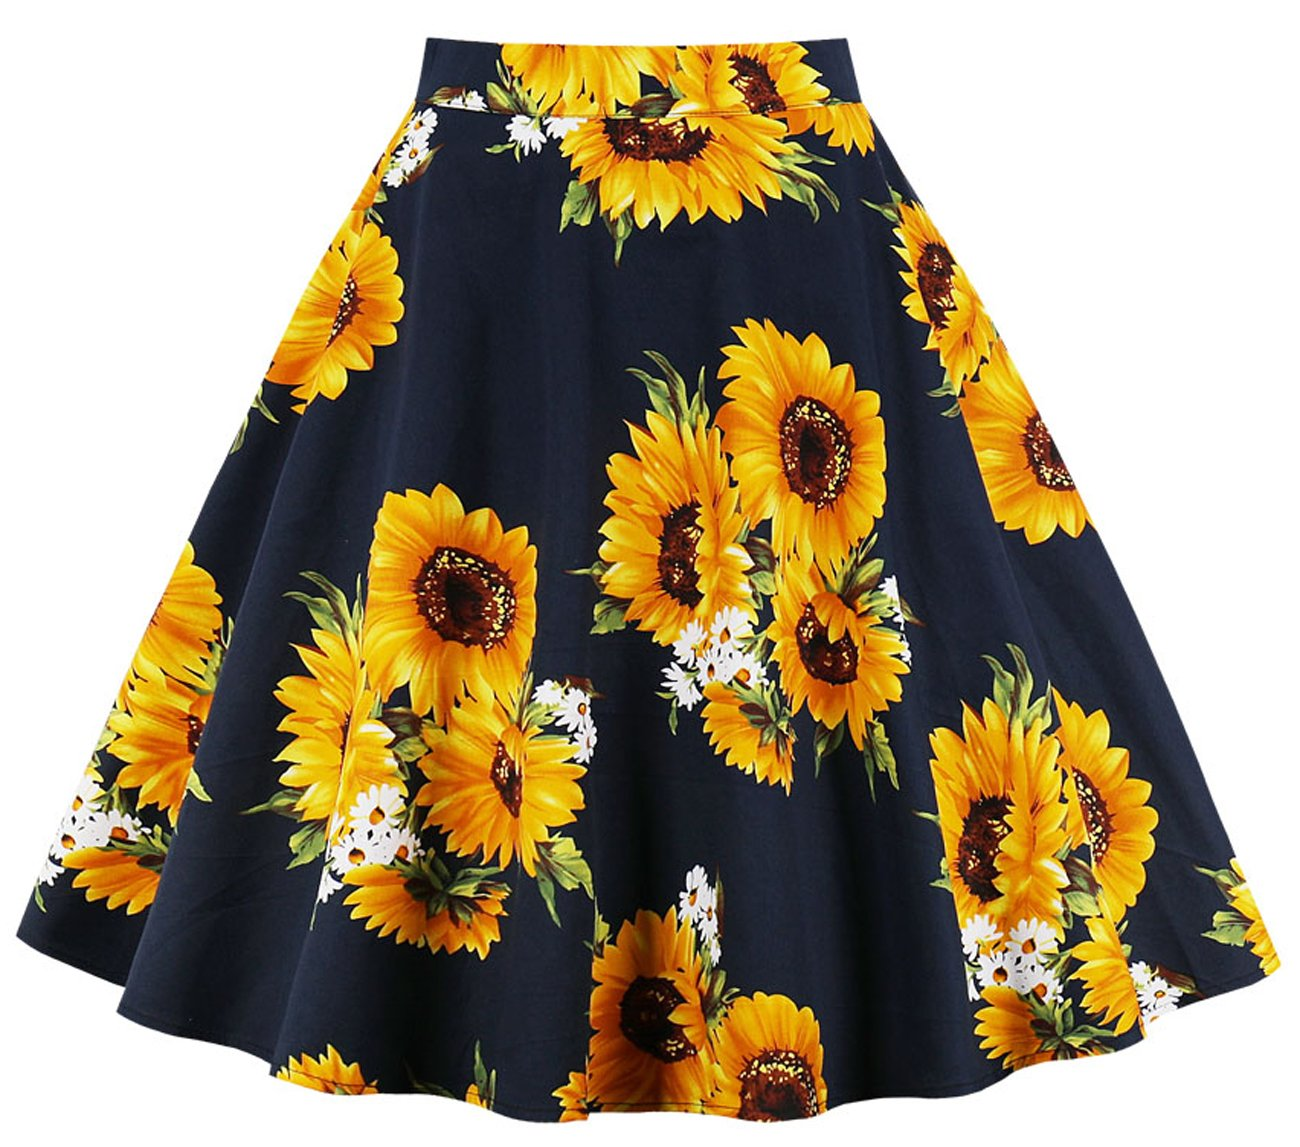 Cleaivy Women's Midi Pleated A Line Floral Printed Vintage Skirts (Black Sun Floral, Medium)